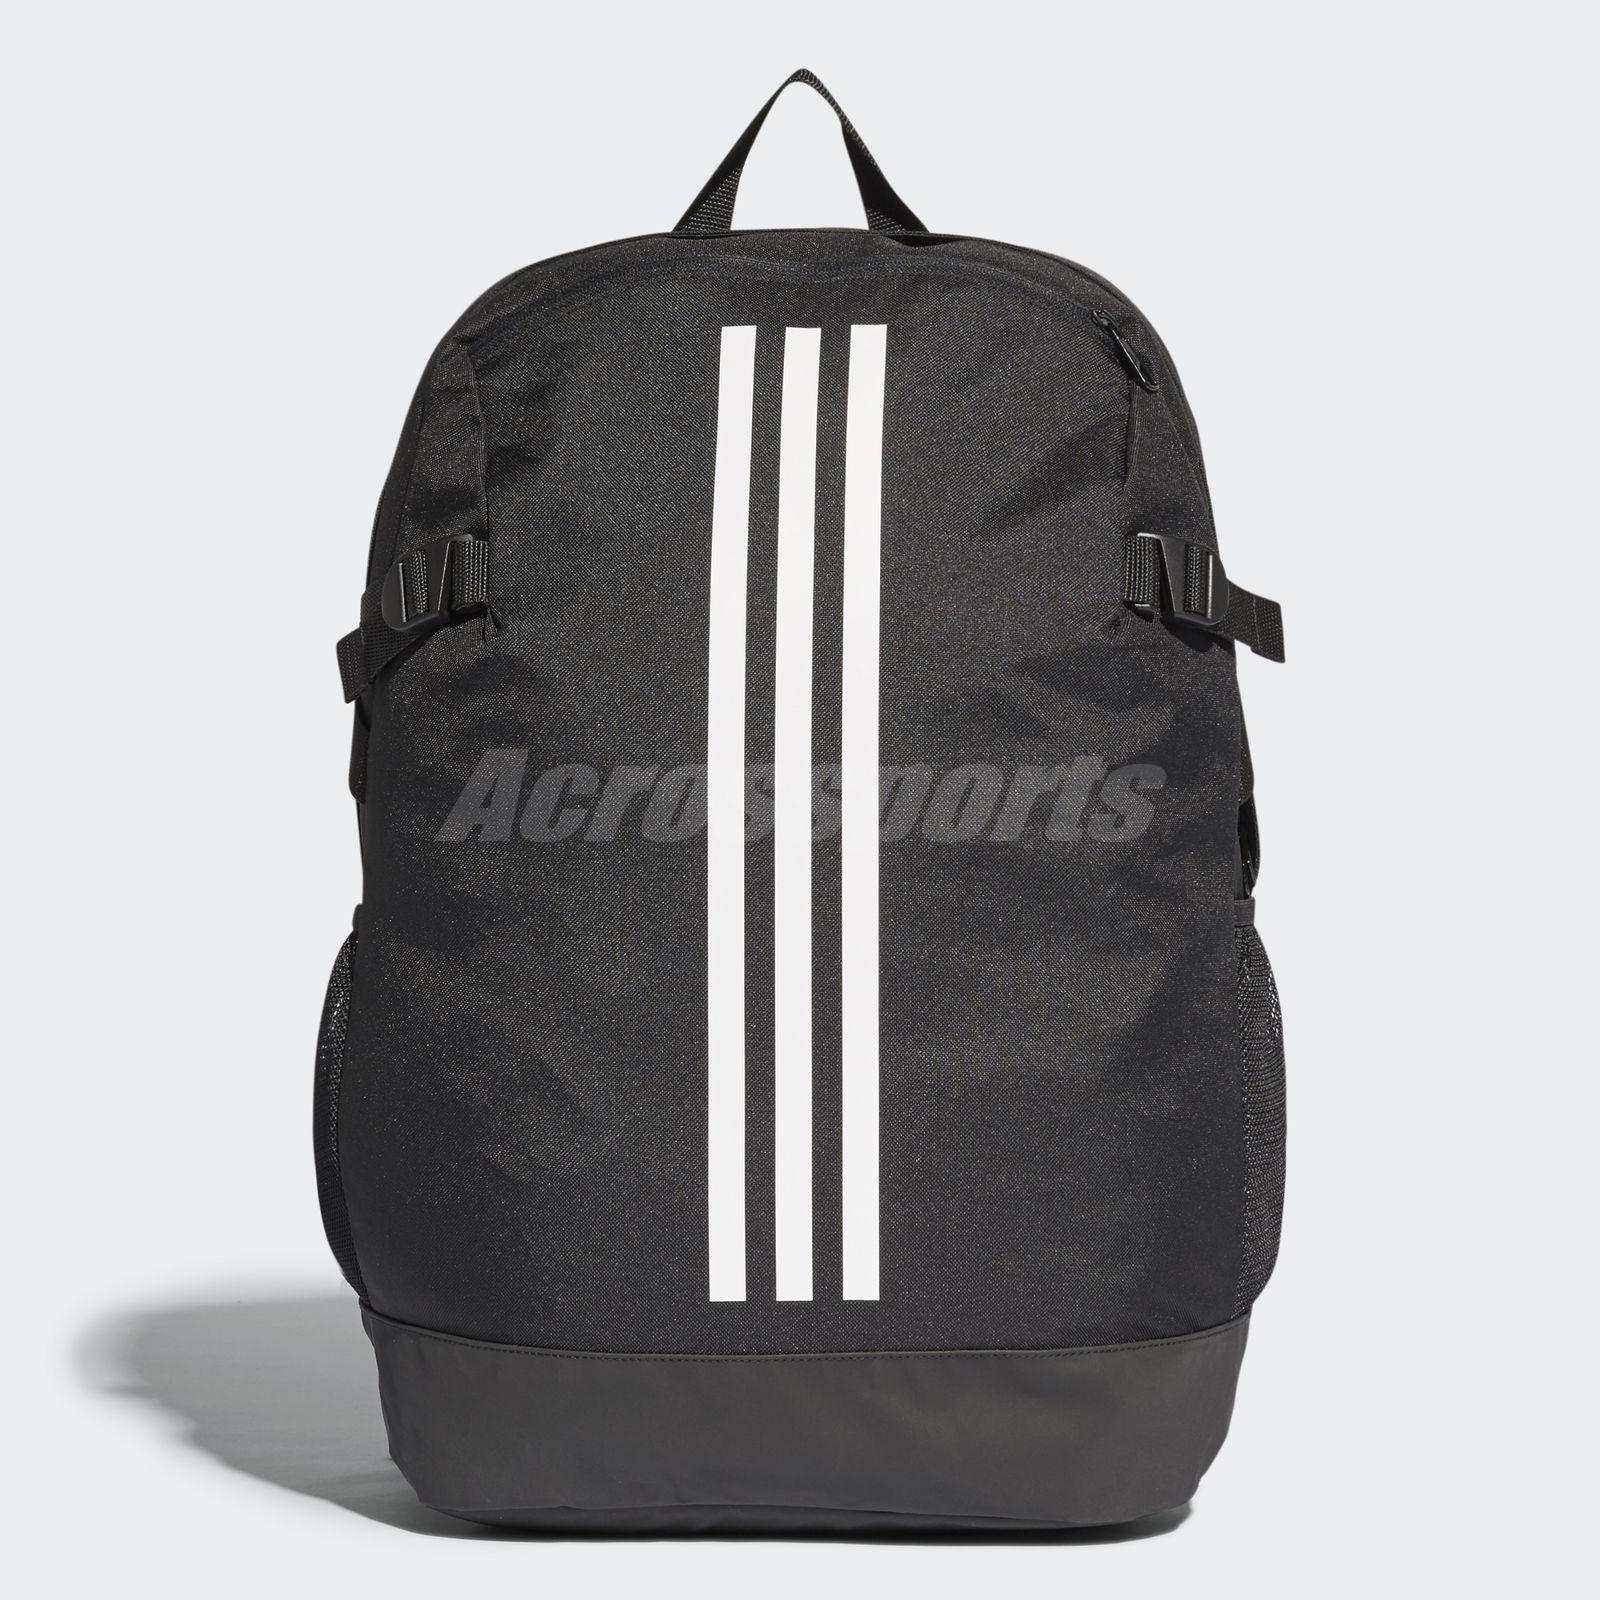 Details about adidas 3-Stripes Power Black White Large Backpack BP Big Bag  BR5863 08ebd6e248